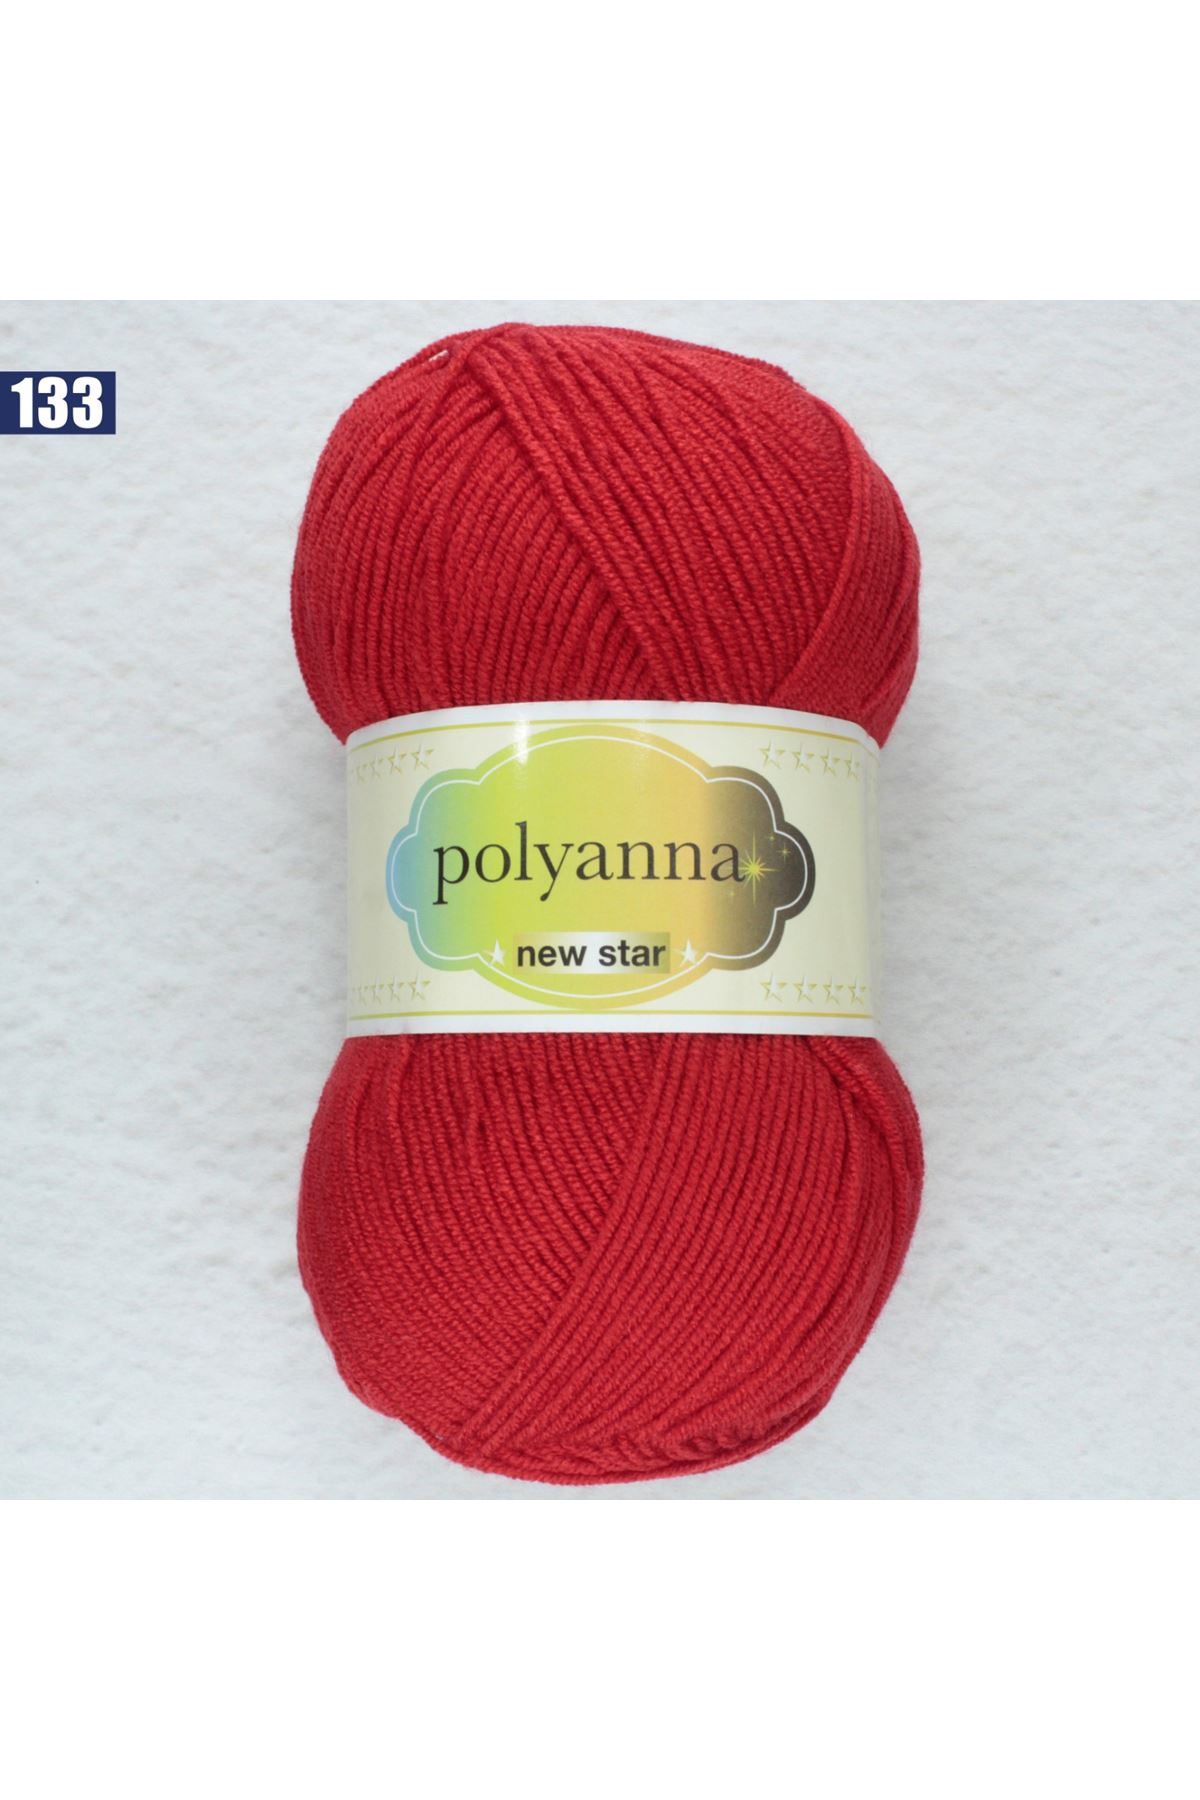 Polyanna New Star 133